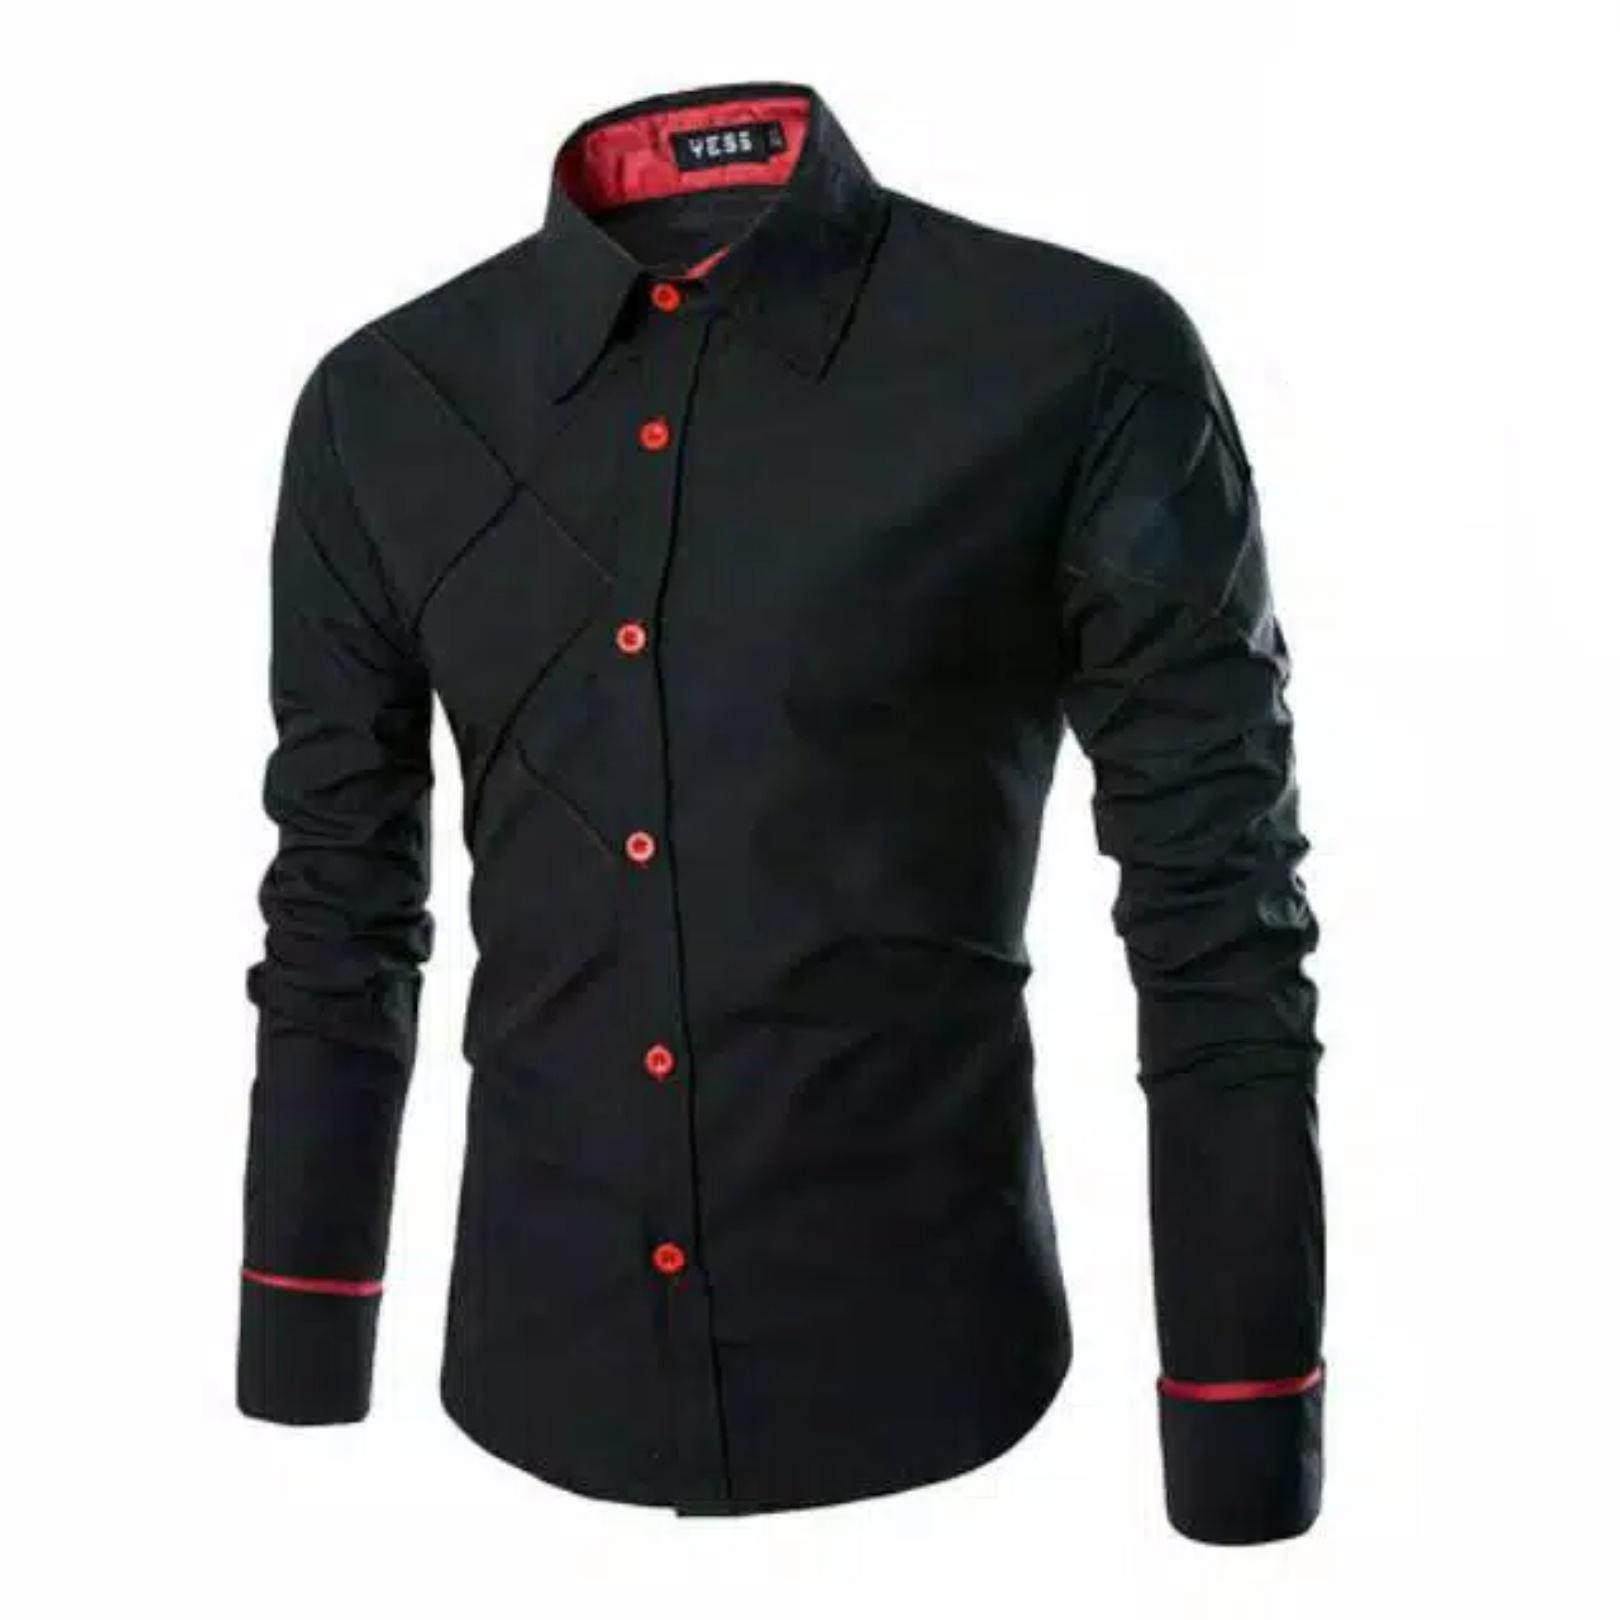 M Fashion - kemeja pria lengan panjang xman / kemeja kantoran / kemeja polosan / baju lebaran / baju koko